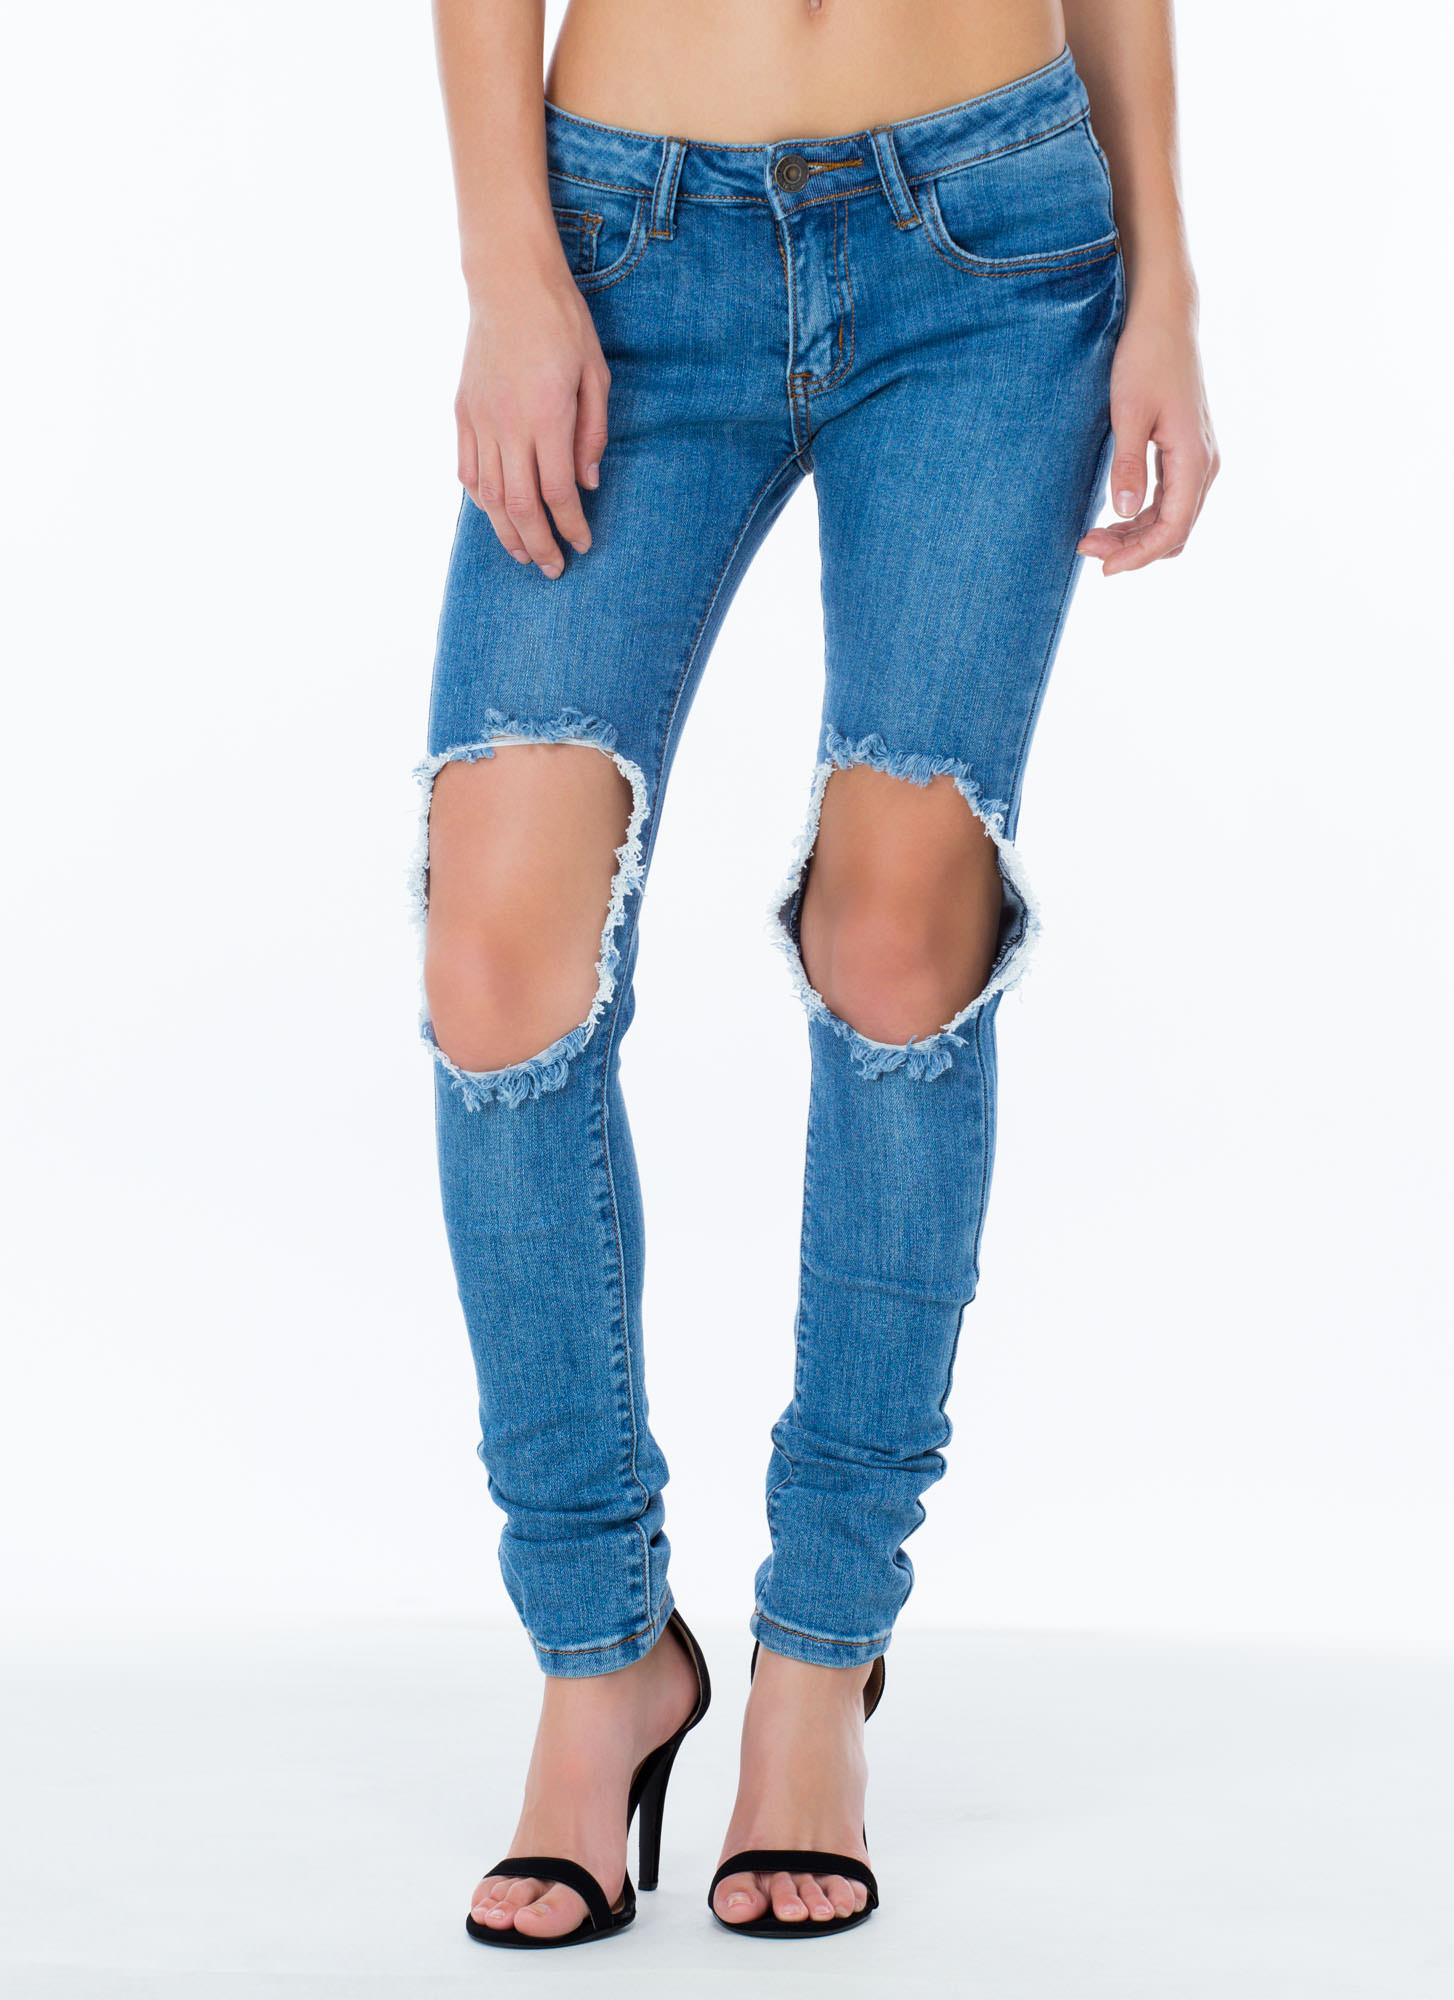 los angeles professional website quality design Take A Knee Cut-Out Jeans BLUE - GoJane.com